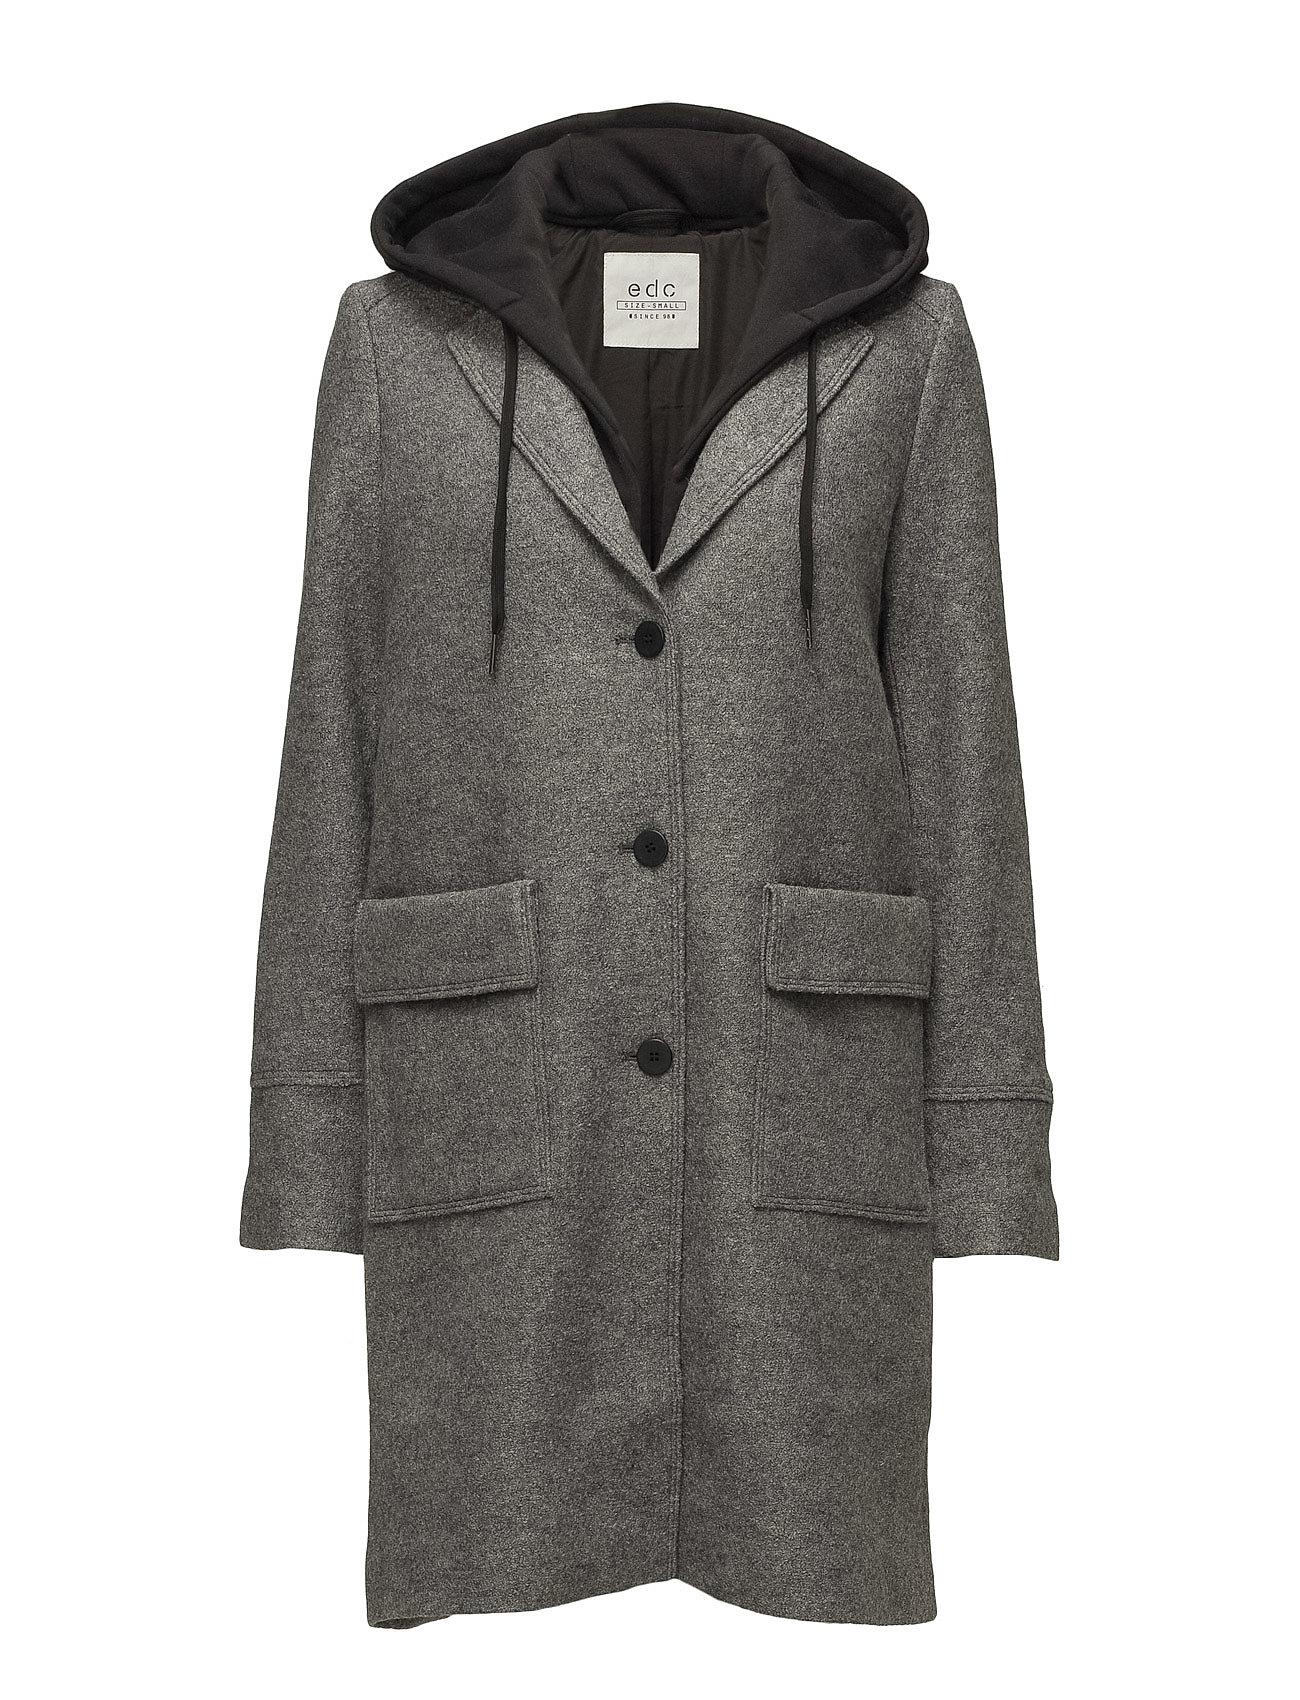 Coats woven fra edc by esprit fra boozt.com dk